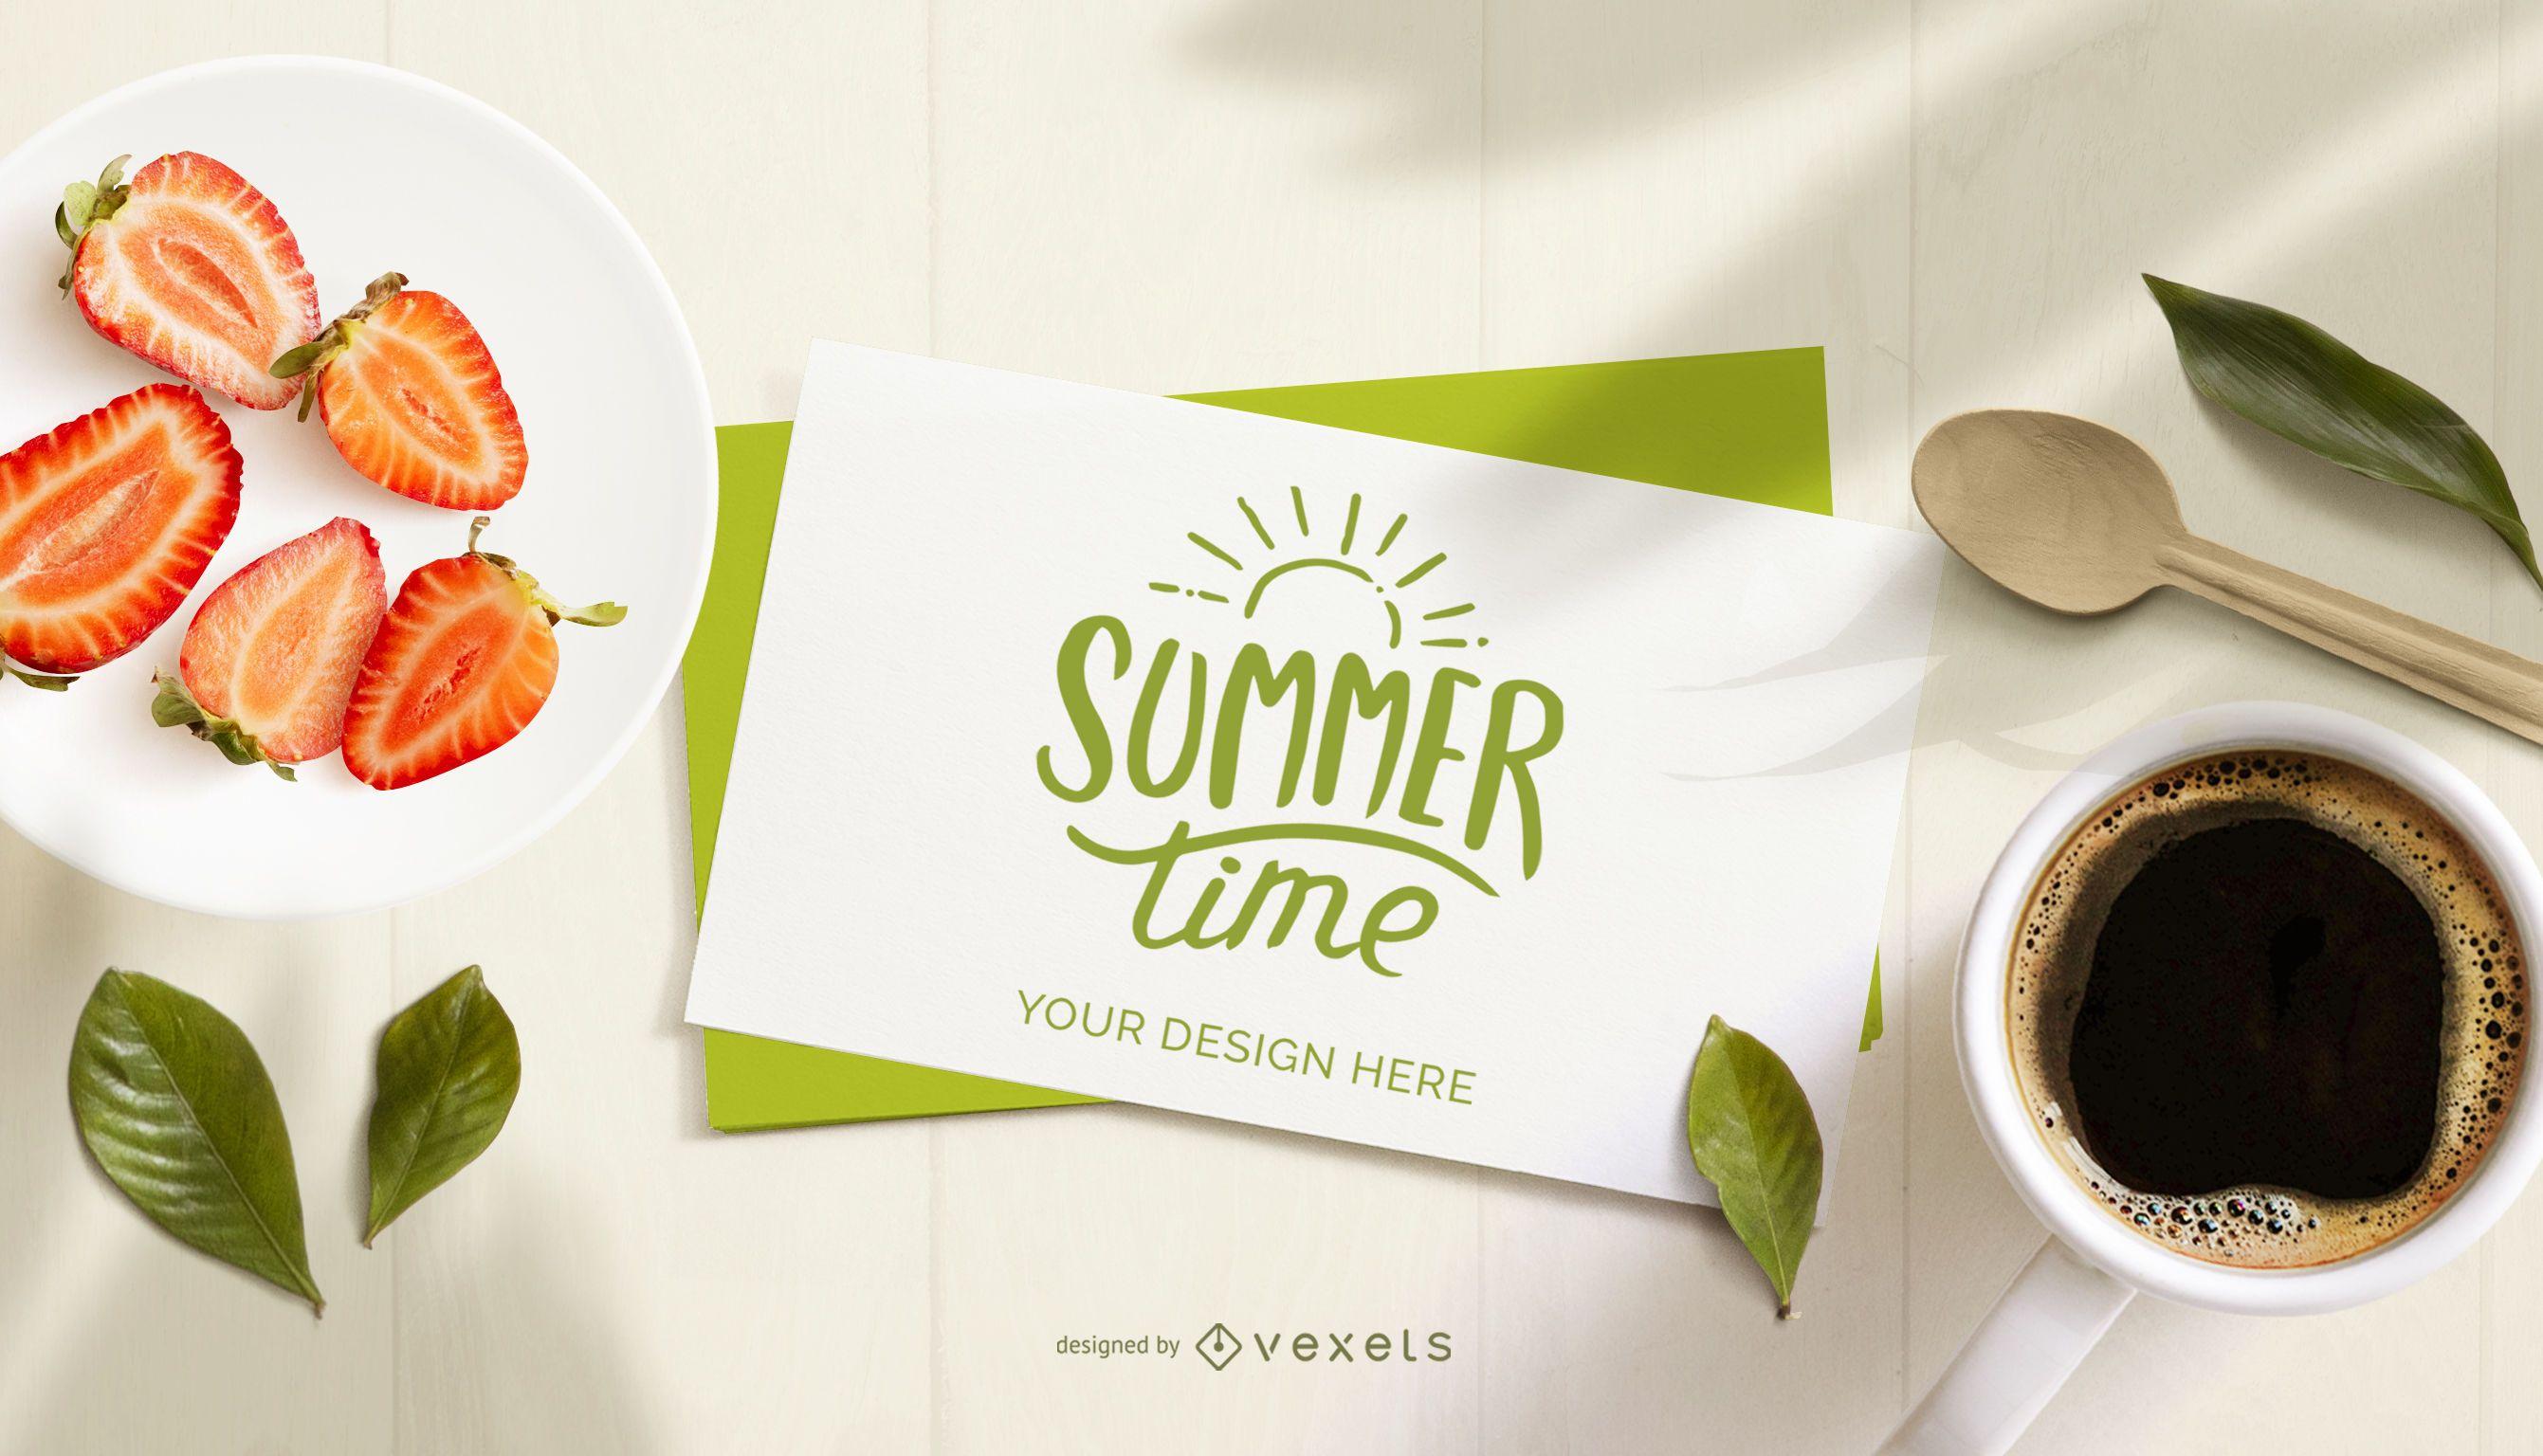 Summer Time Card Composition Mockup